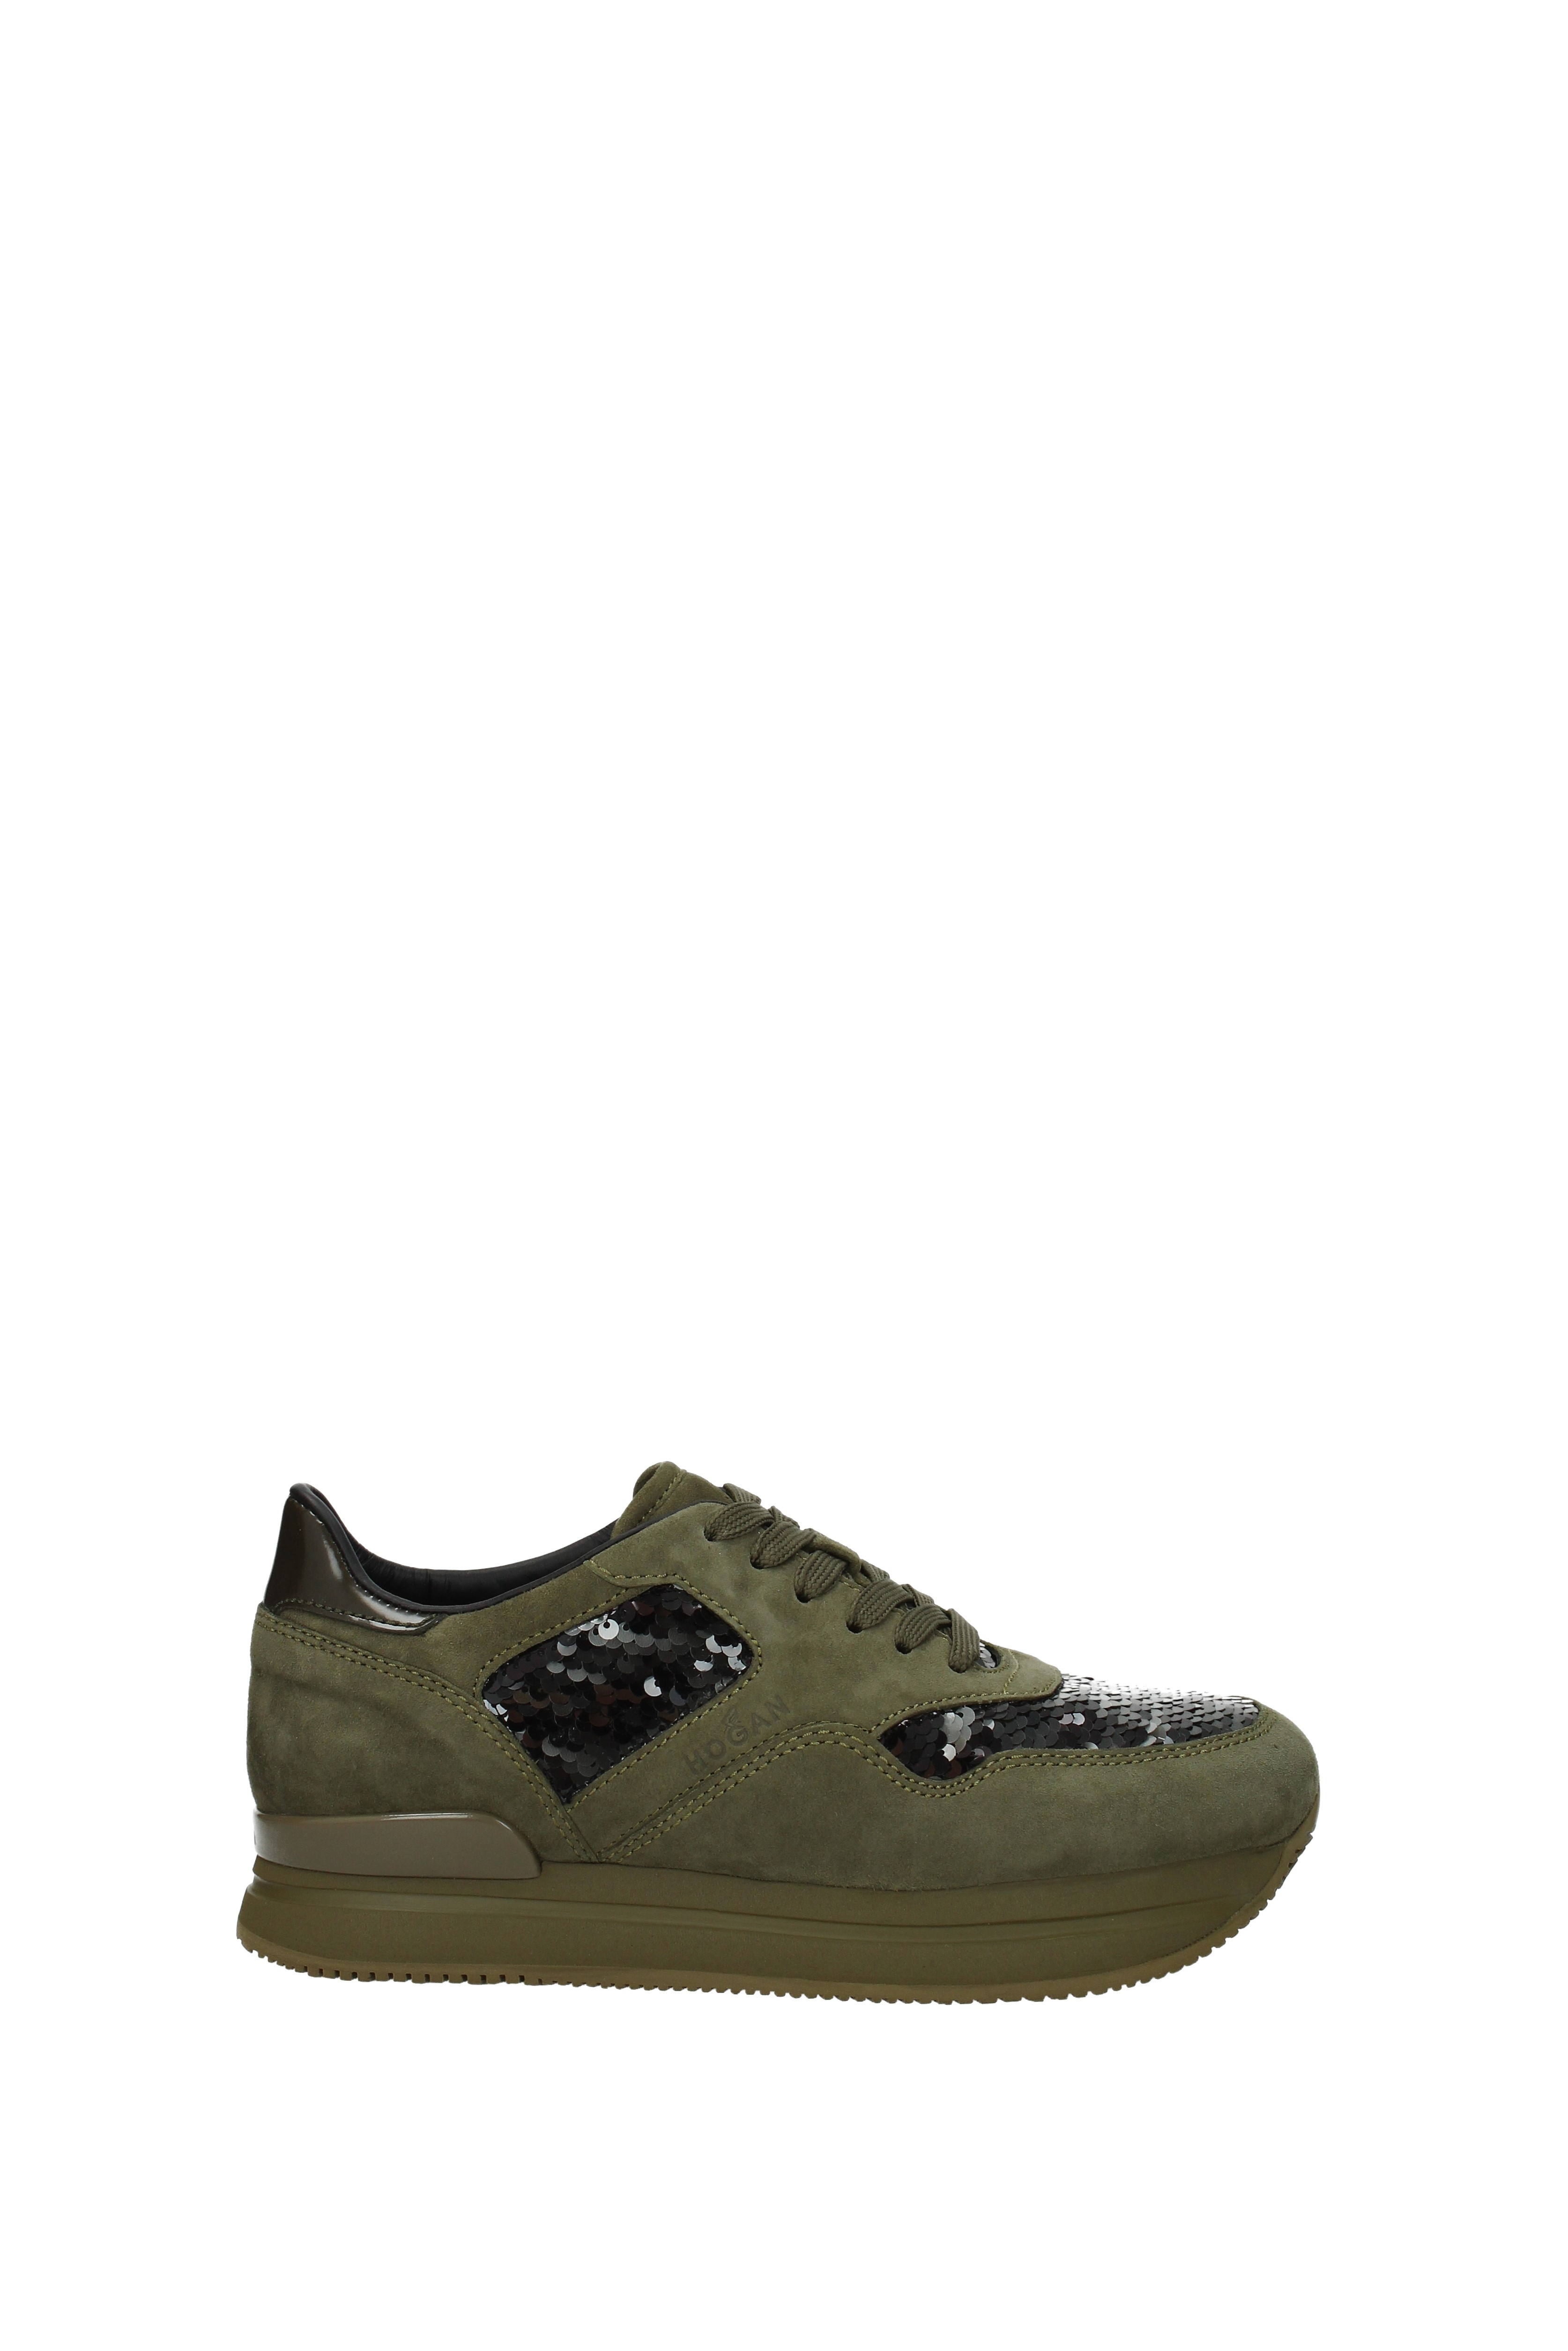 Alta qualit HXW2220N622H6P Sneakers Hogan Donna Camoscio HXW2220N622H6P qualit vendita 2e42ef